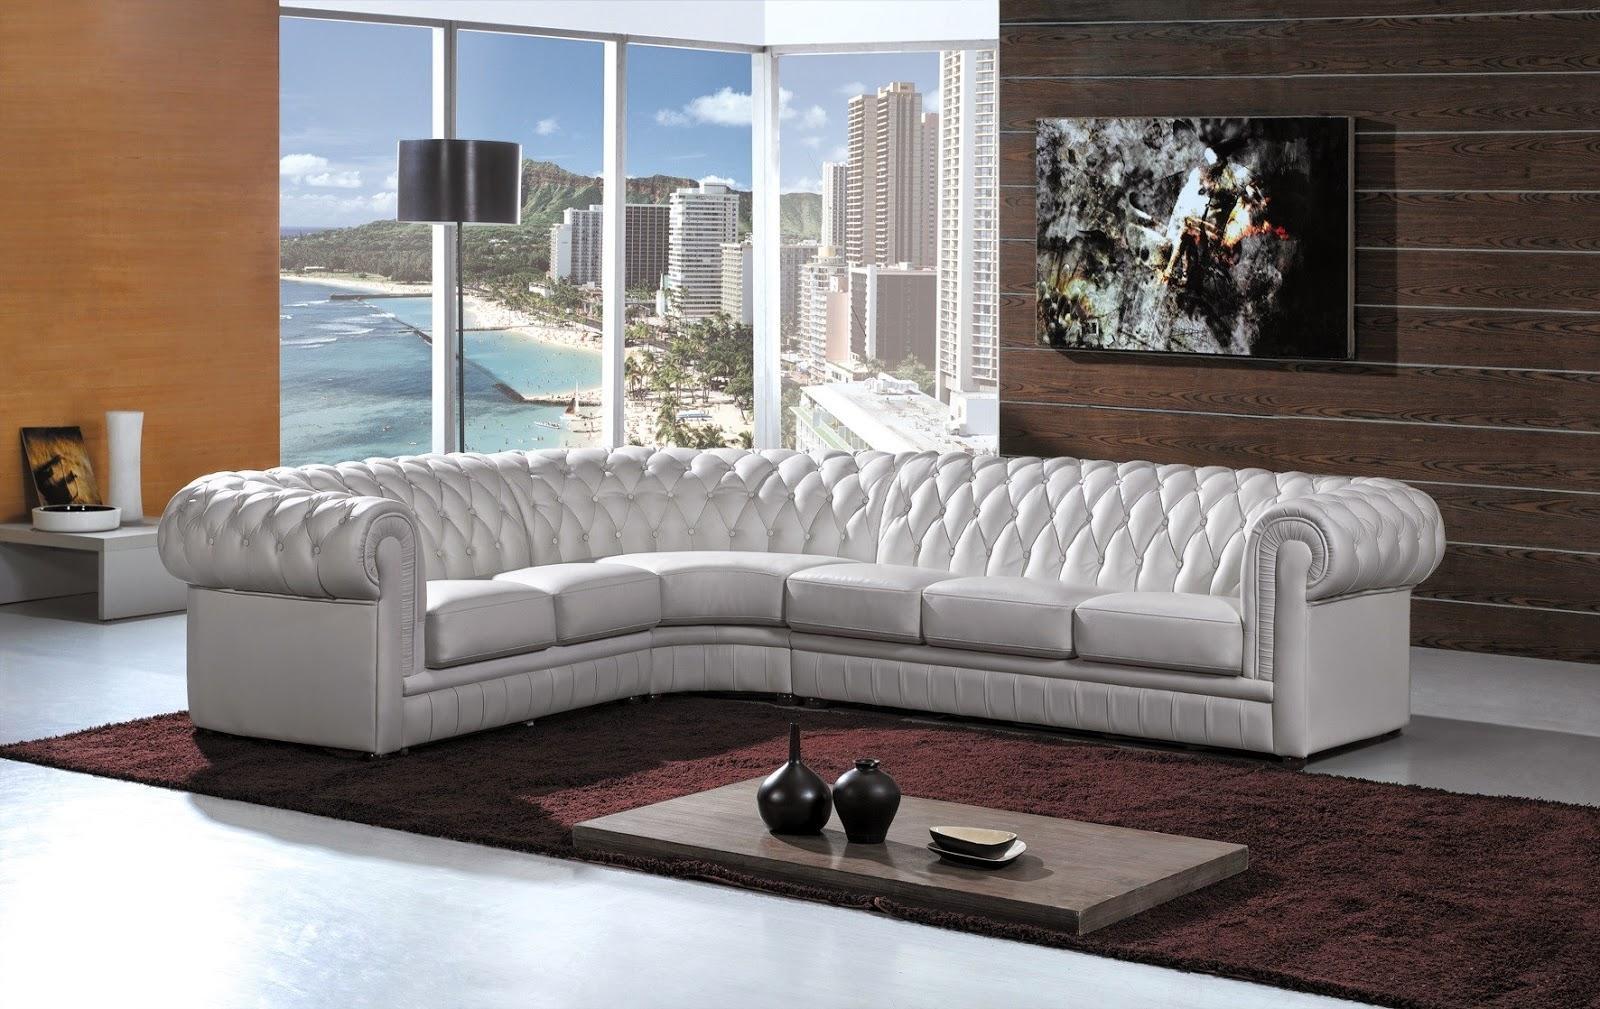 White Leather Sofa Pertaining To White Leather Corner Sofa (View 18 of 20)